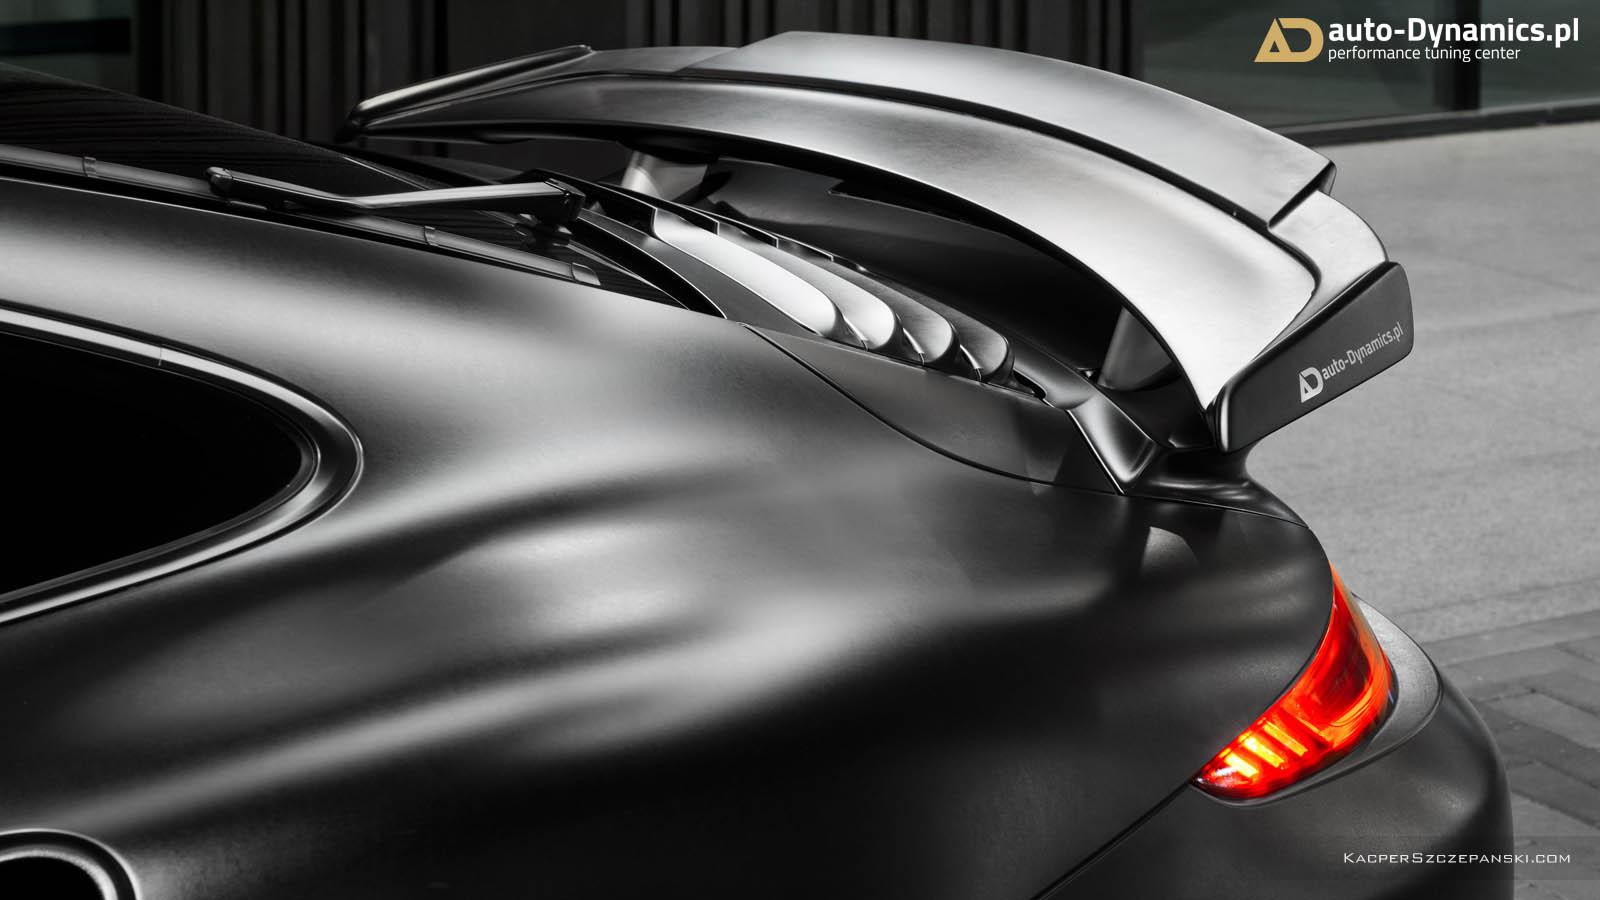 Porsche 911 Turbo S by Auto-Dynamics (12)